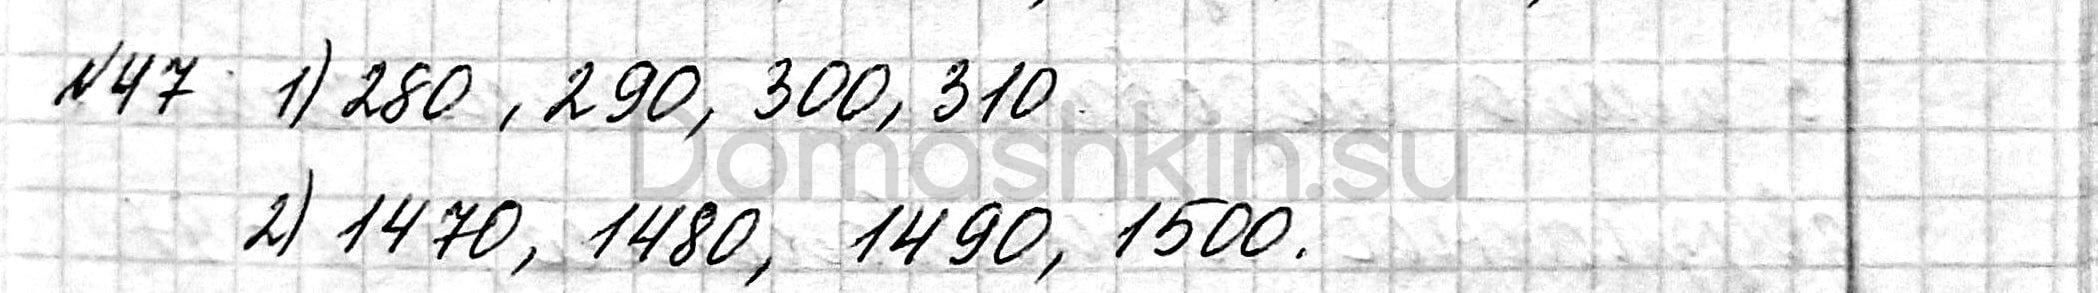 Математика 6 класс учебник Мерзляк номер 47 решение